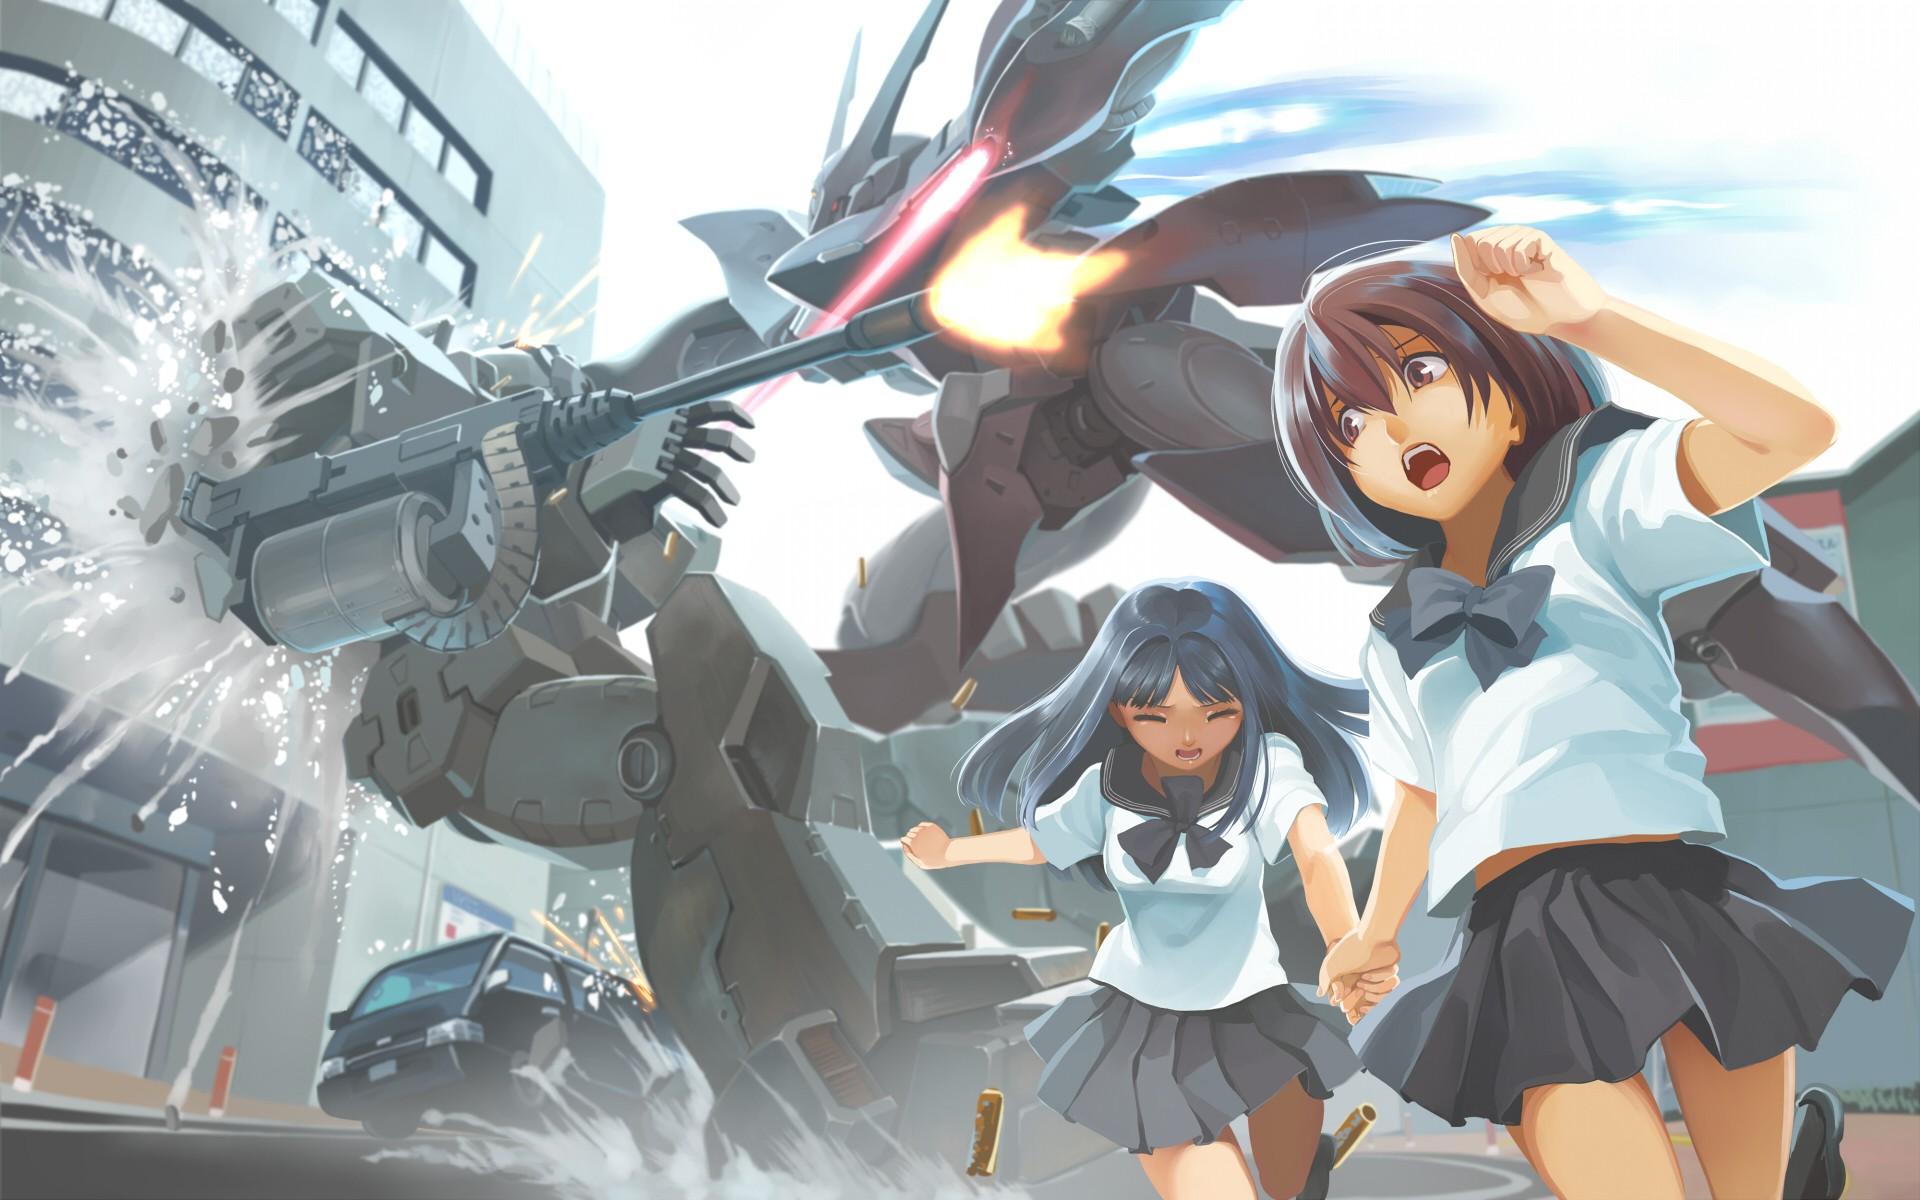 anime war wallpaper - photo #34